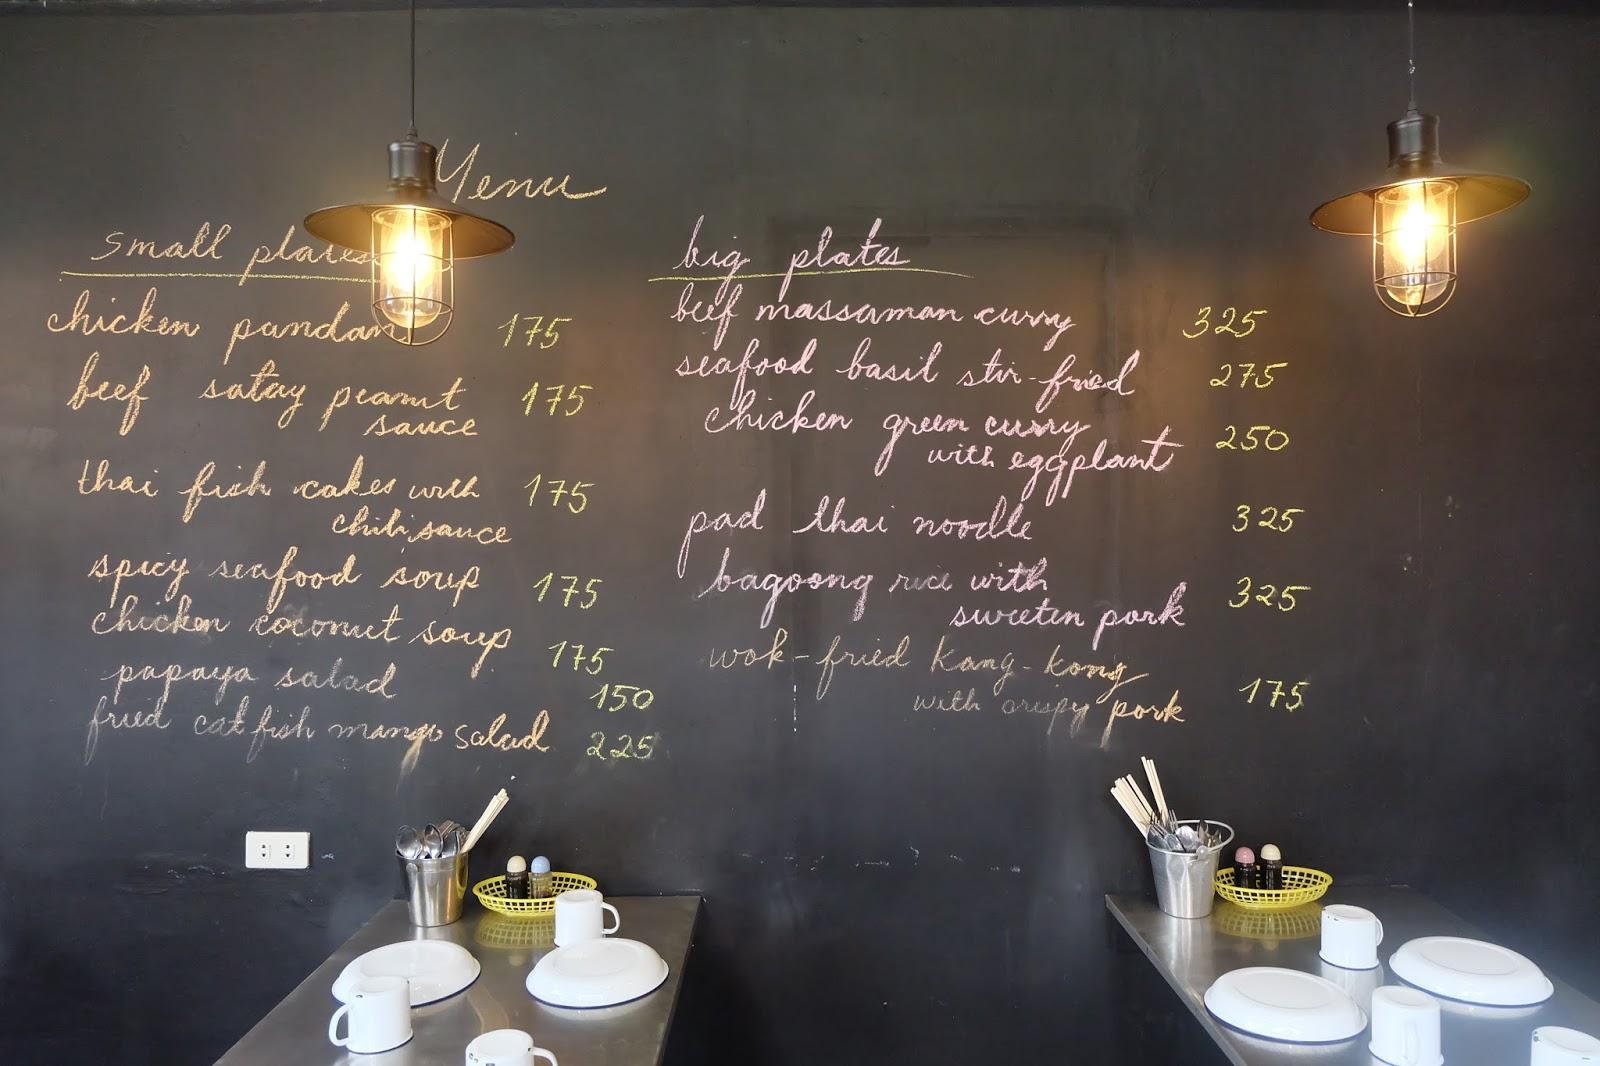 4 Reasons Why You Should Visit Cafe Fleur